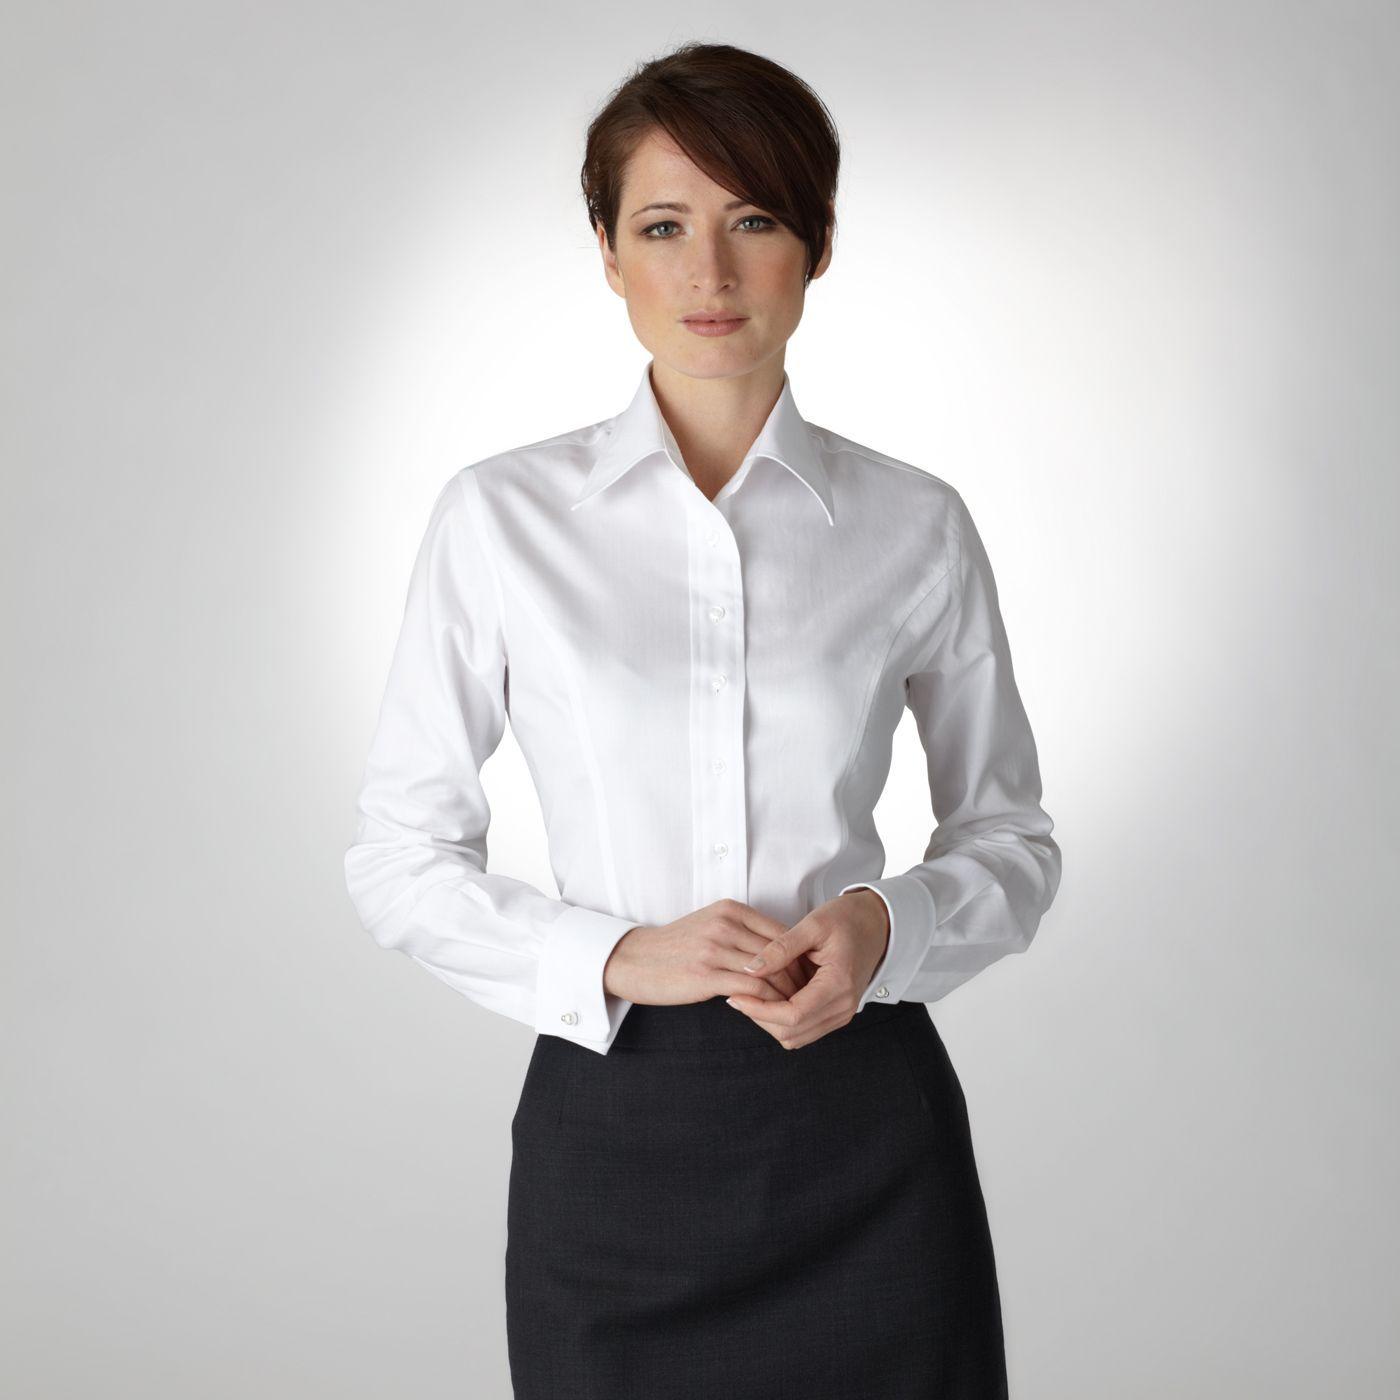 Tm Lewin Lycra Shirt Review Rockwall Auction